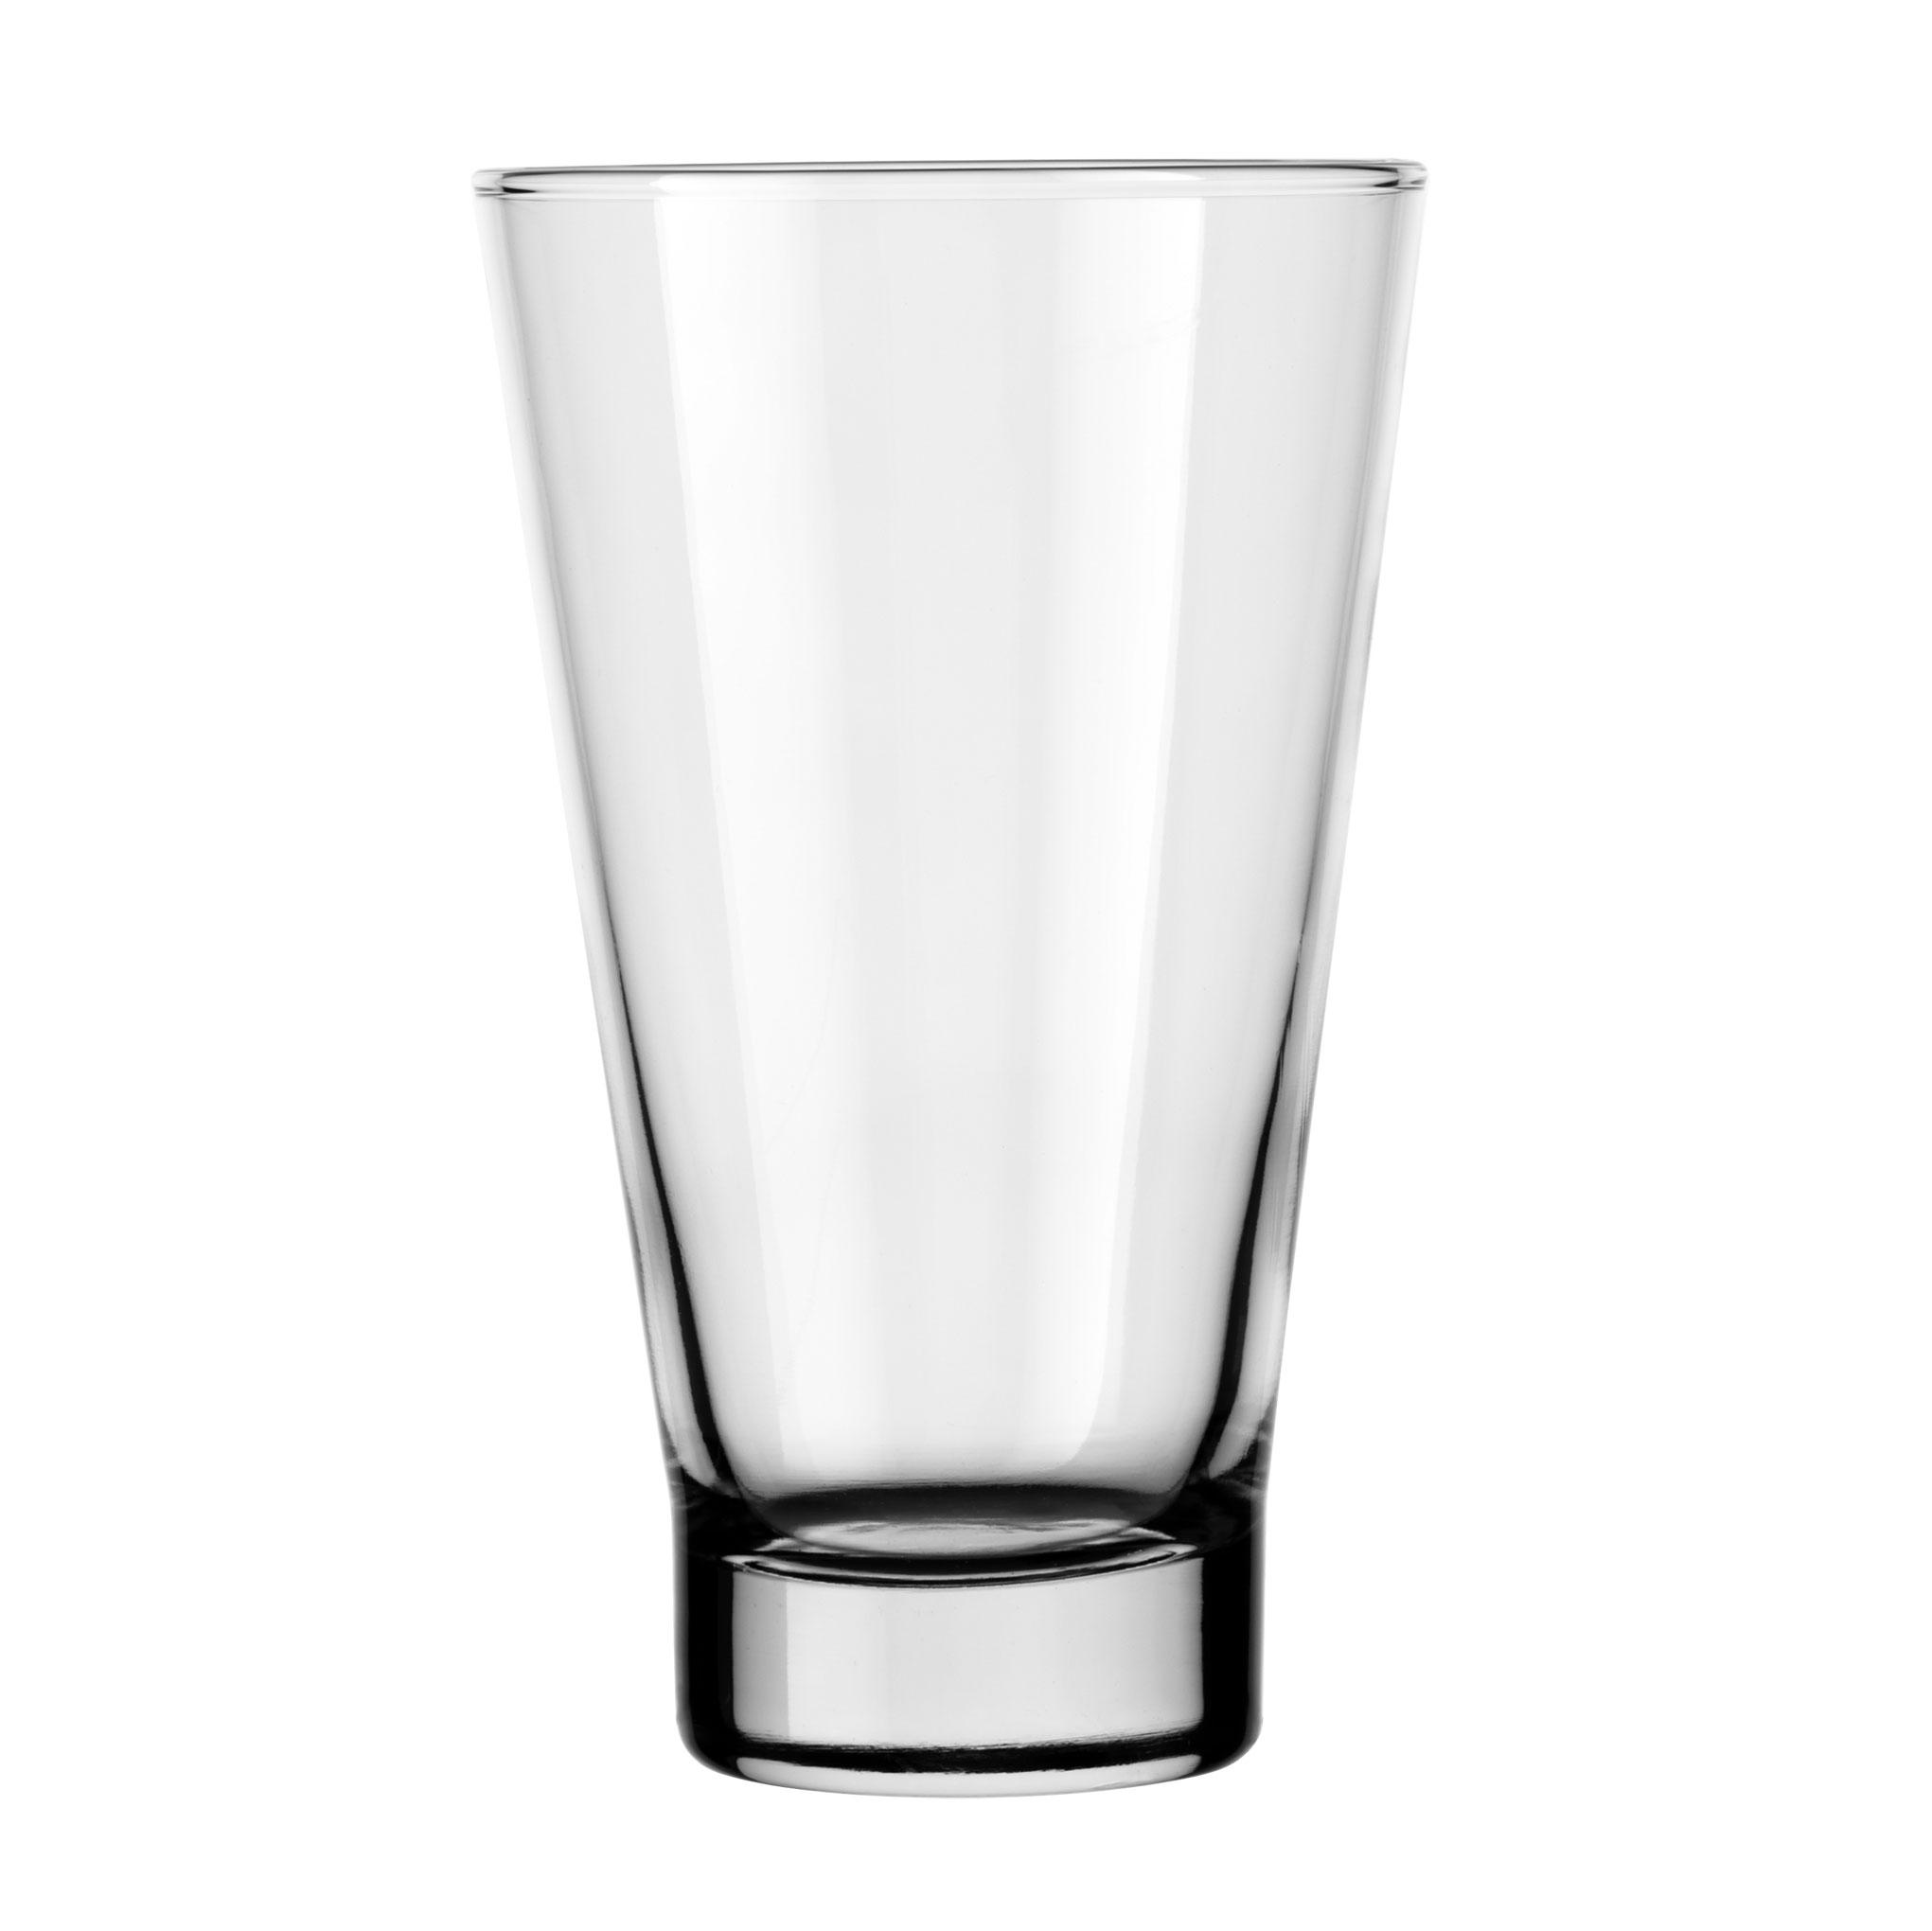 Libbey Glass 2046 glass, hi ball